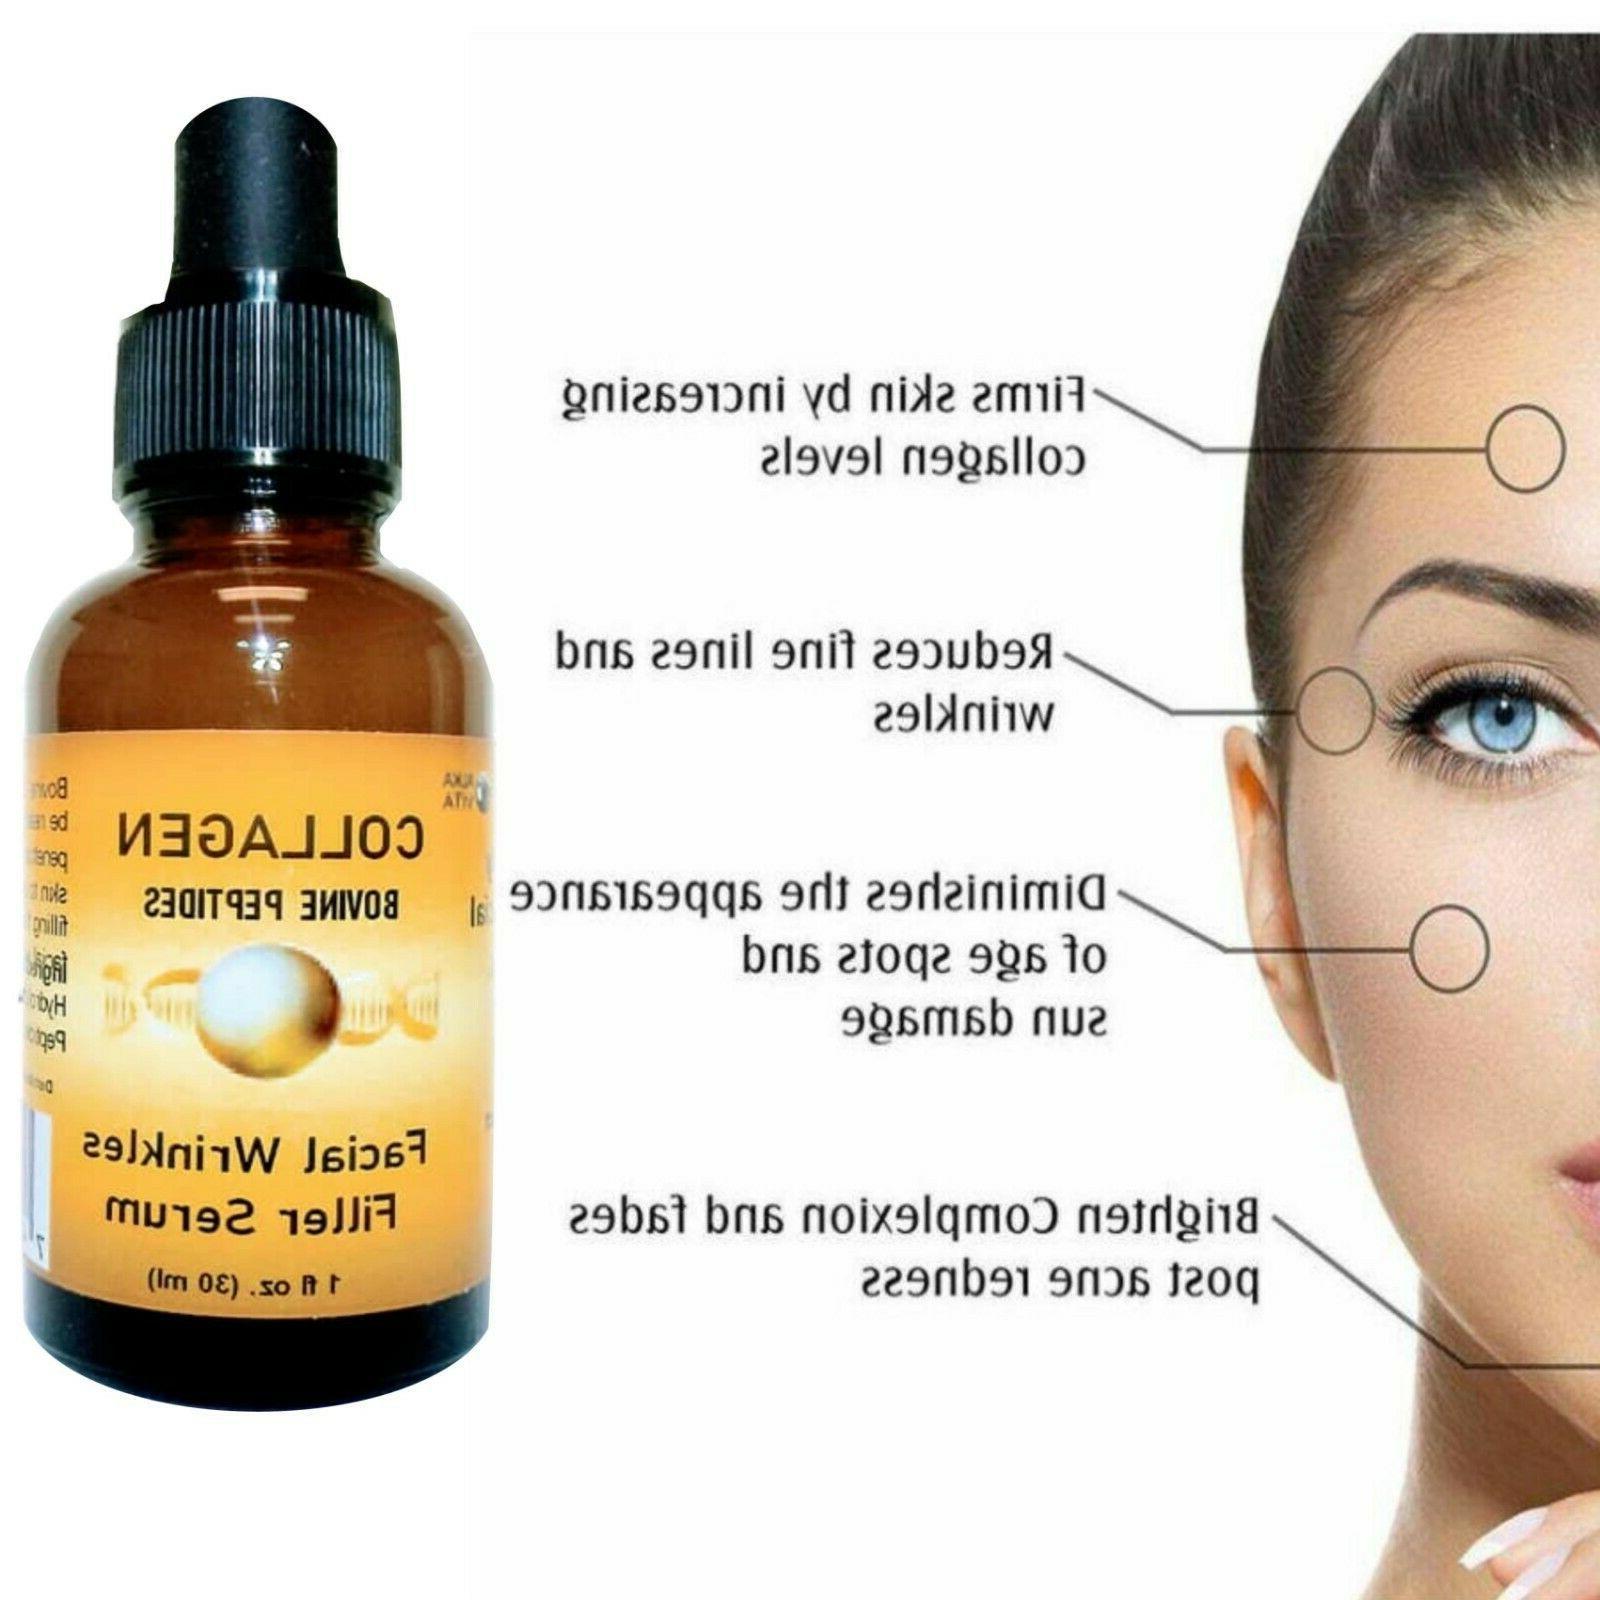 collagen peptides serum skin wrinkles filler hydrolyzed